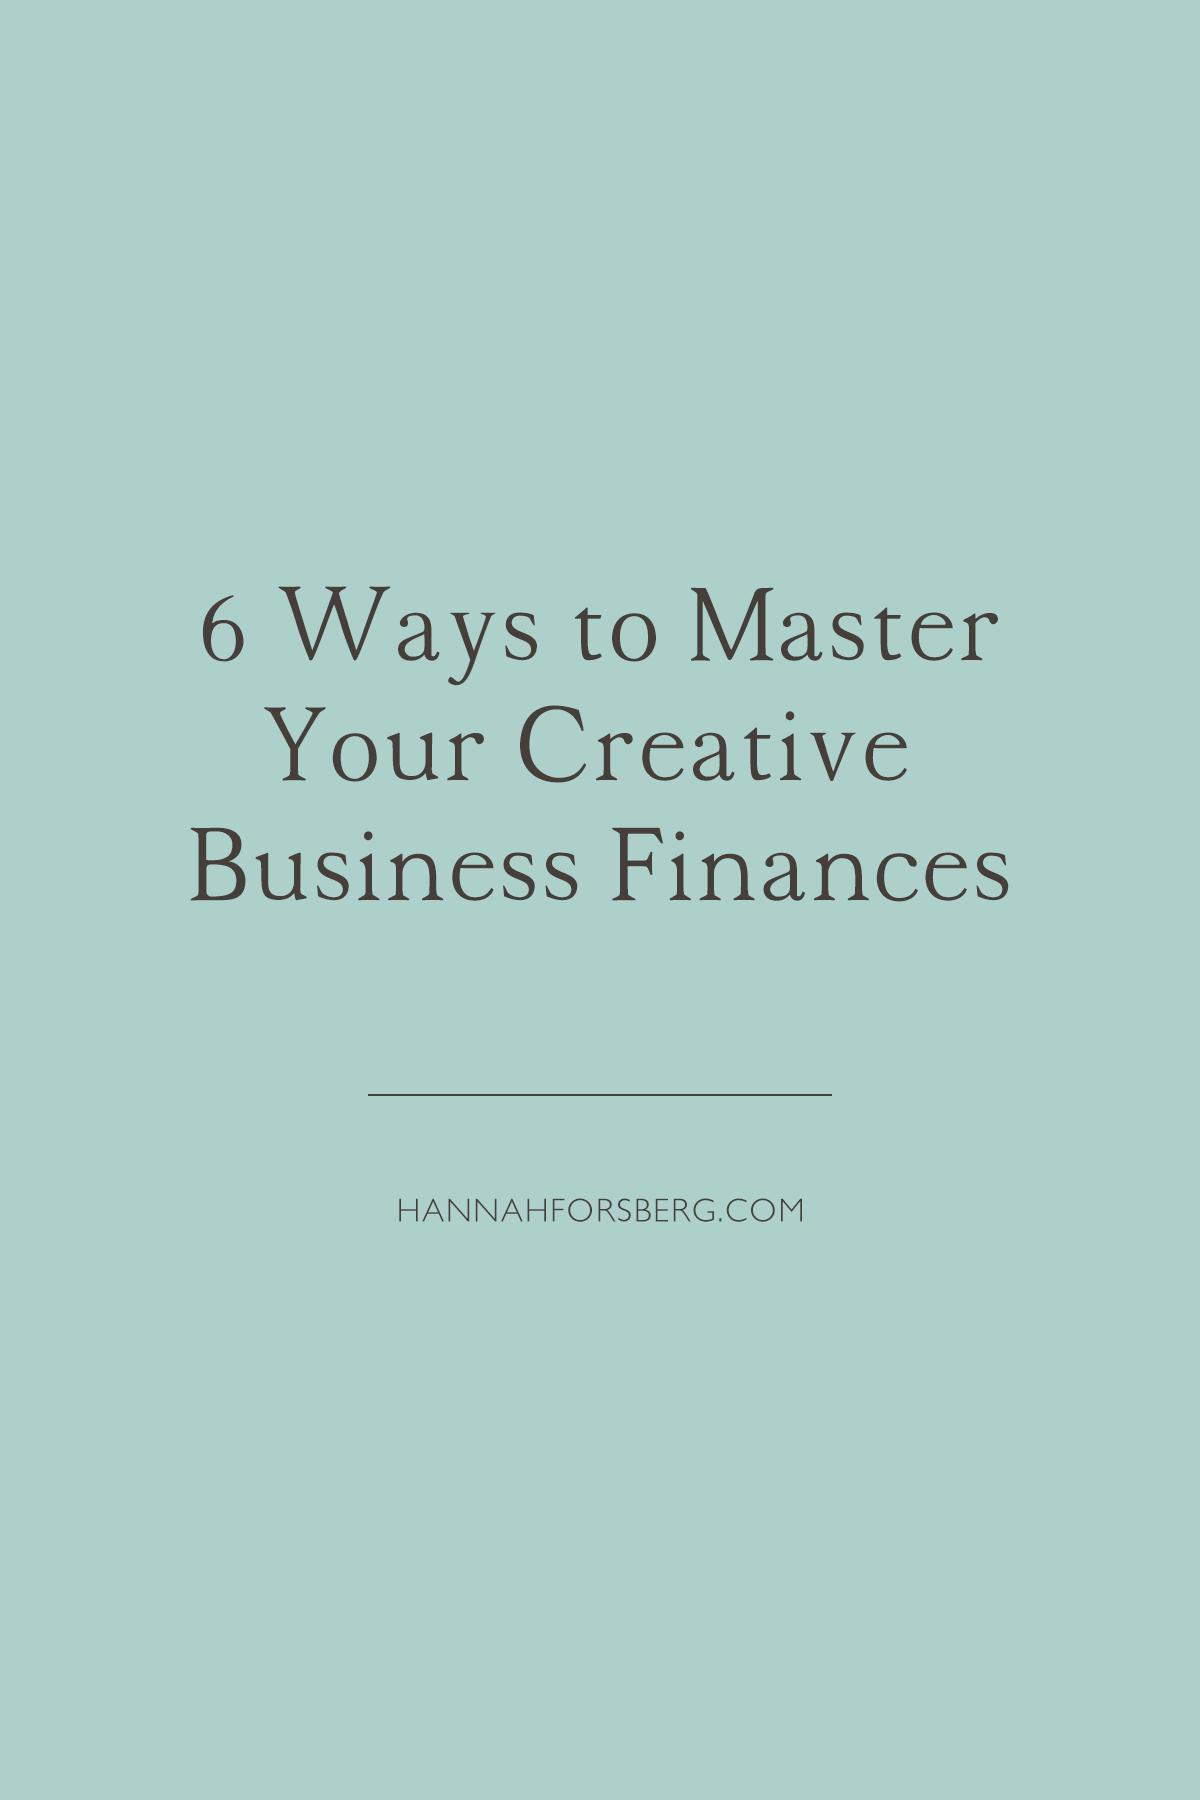 6 ways to master your creative business finances quickbooks hannah forsberg atlanta wedding photographer.png